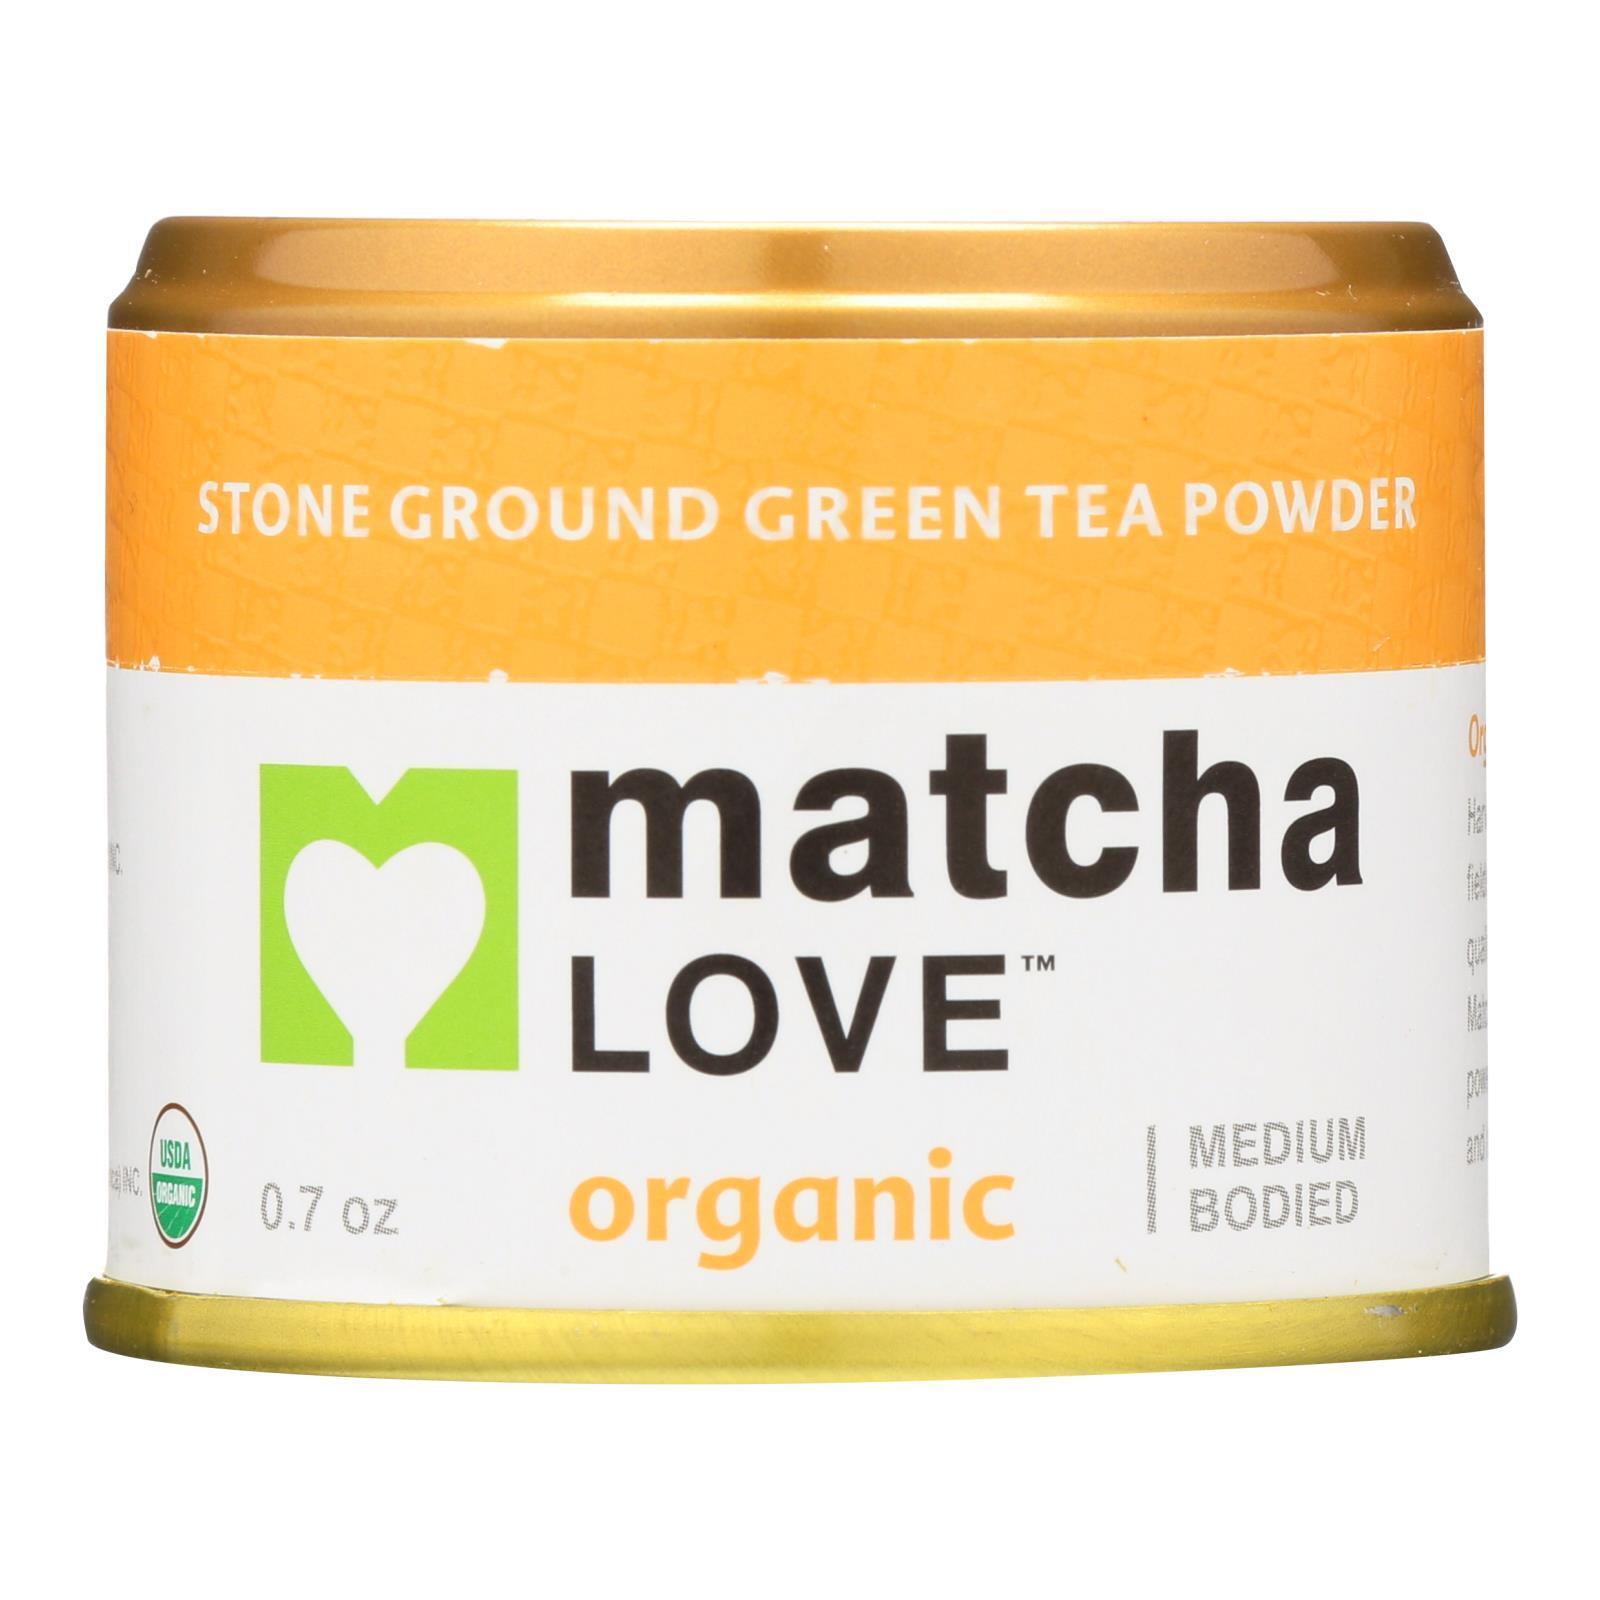 Matcha Love Green Tea Powder - Medium Bodied - Case of 10 - 0.7 oz.